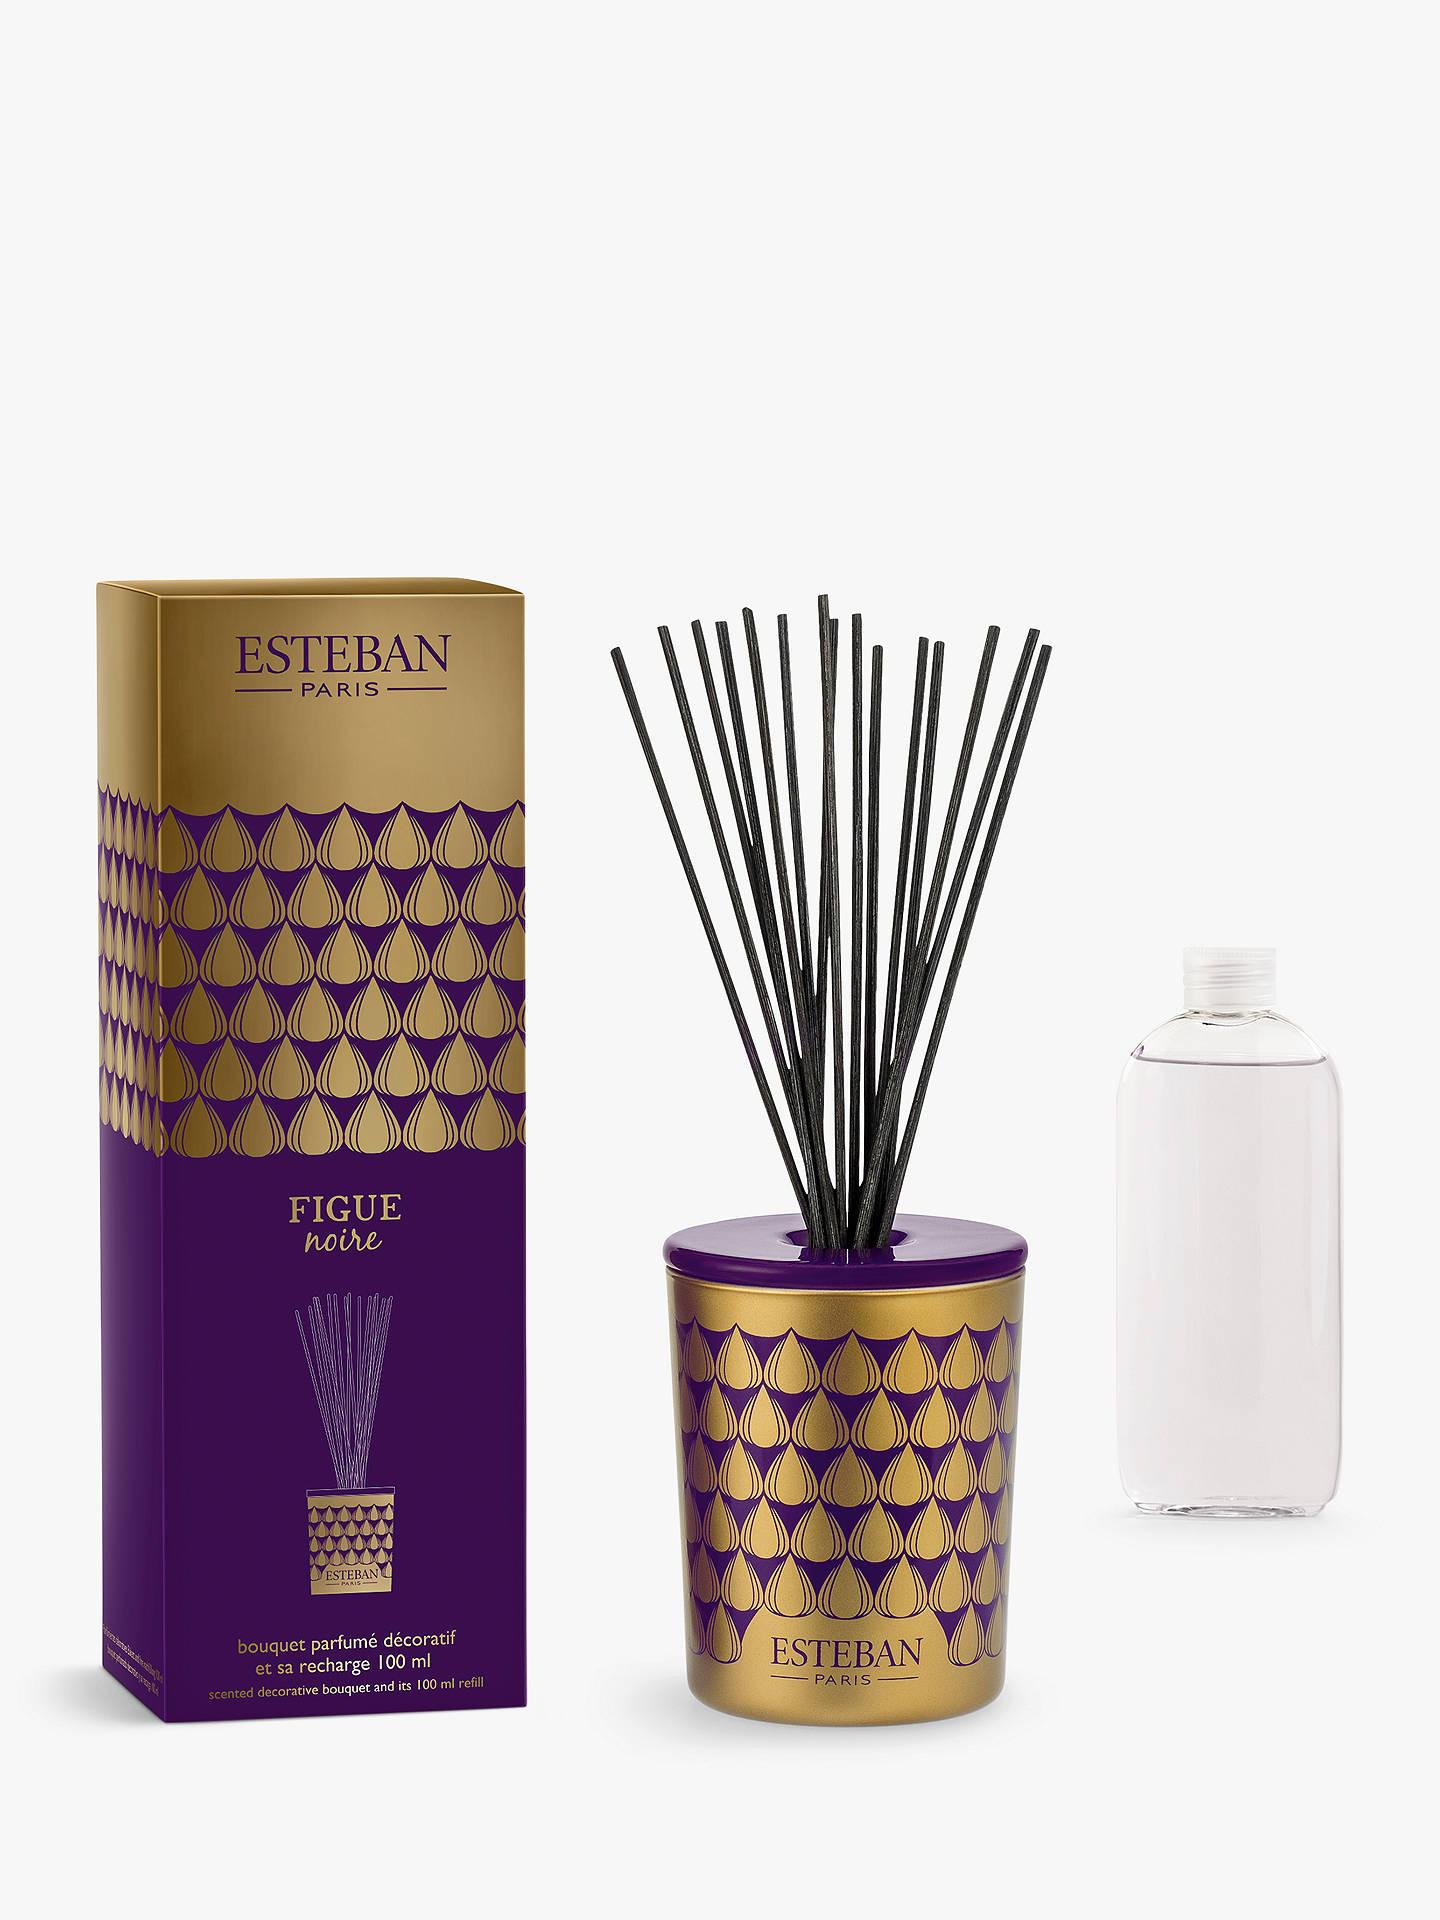 Esteban decorative scented reed diffuser 100ml at john for Decorative diffuser